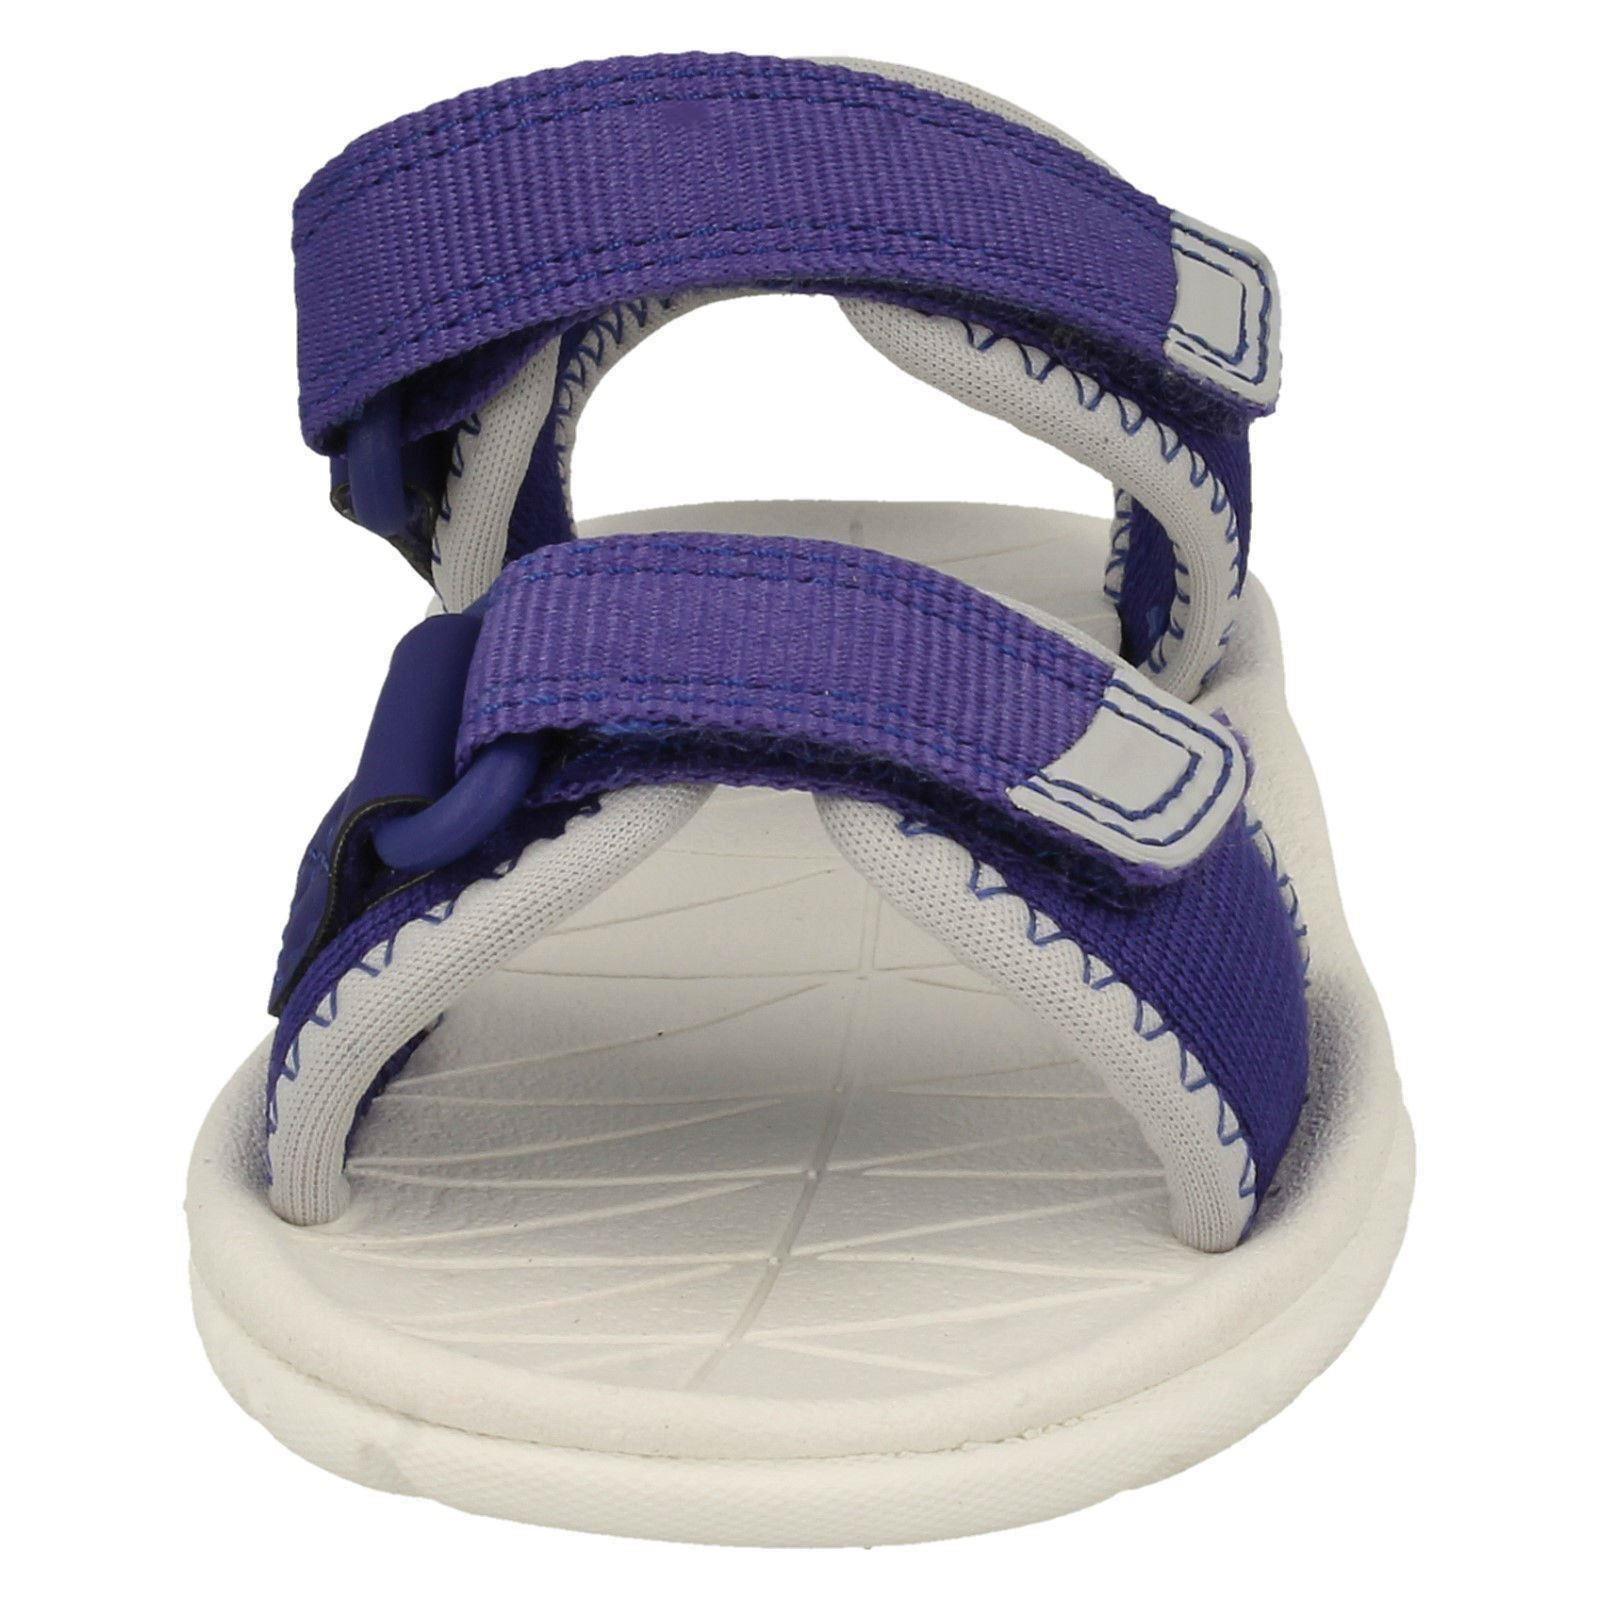 Childrens Boys Girls Clarks Light Weight Sandals Surfing Tide